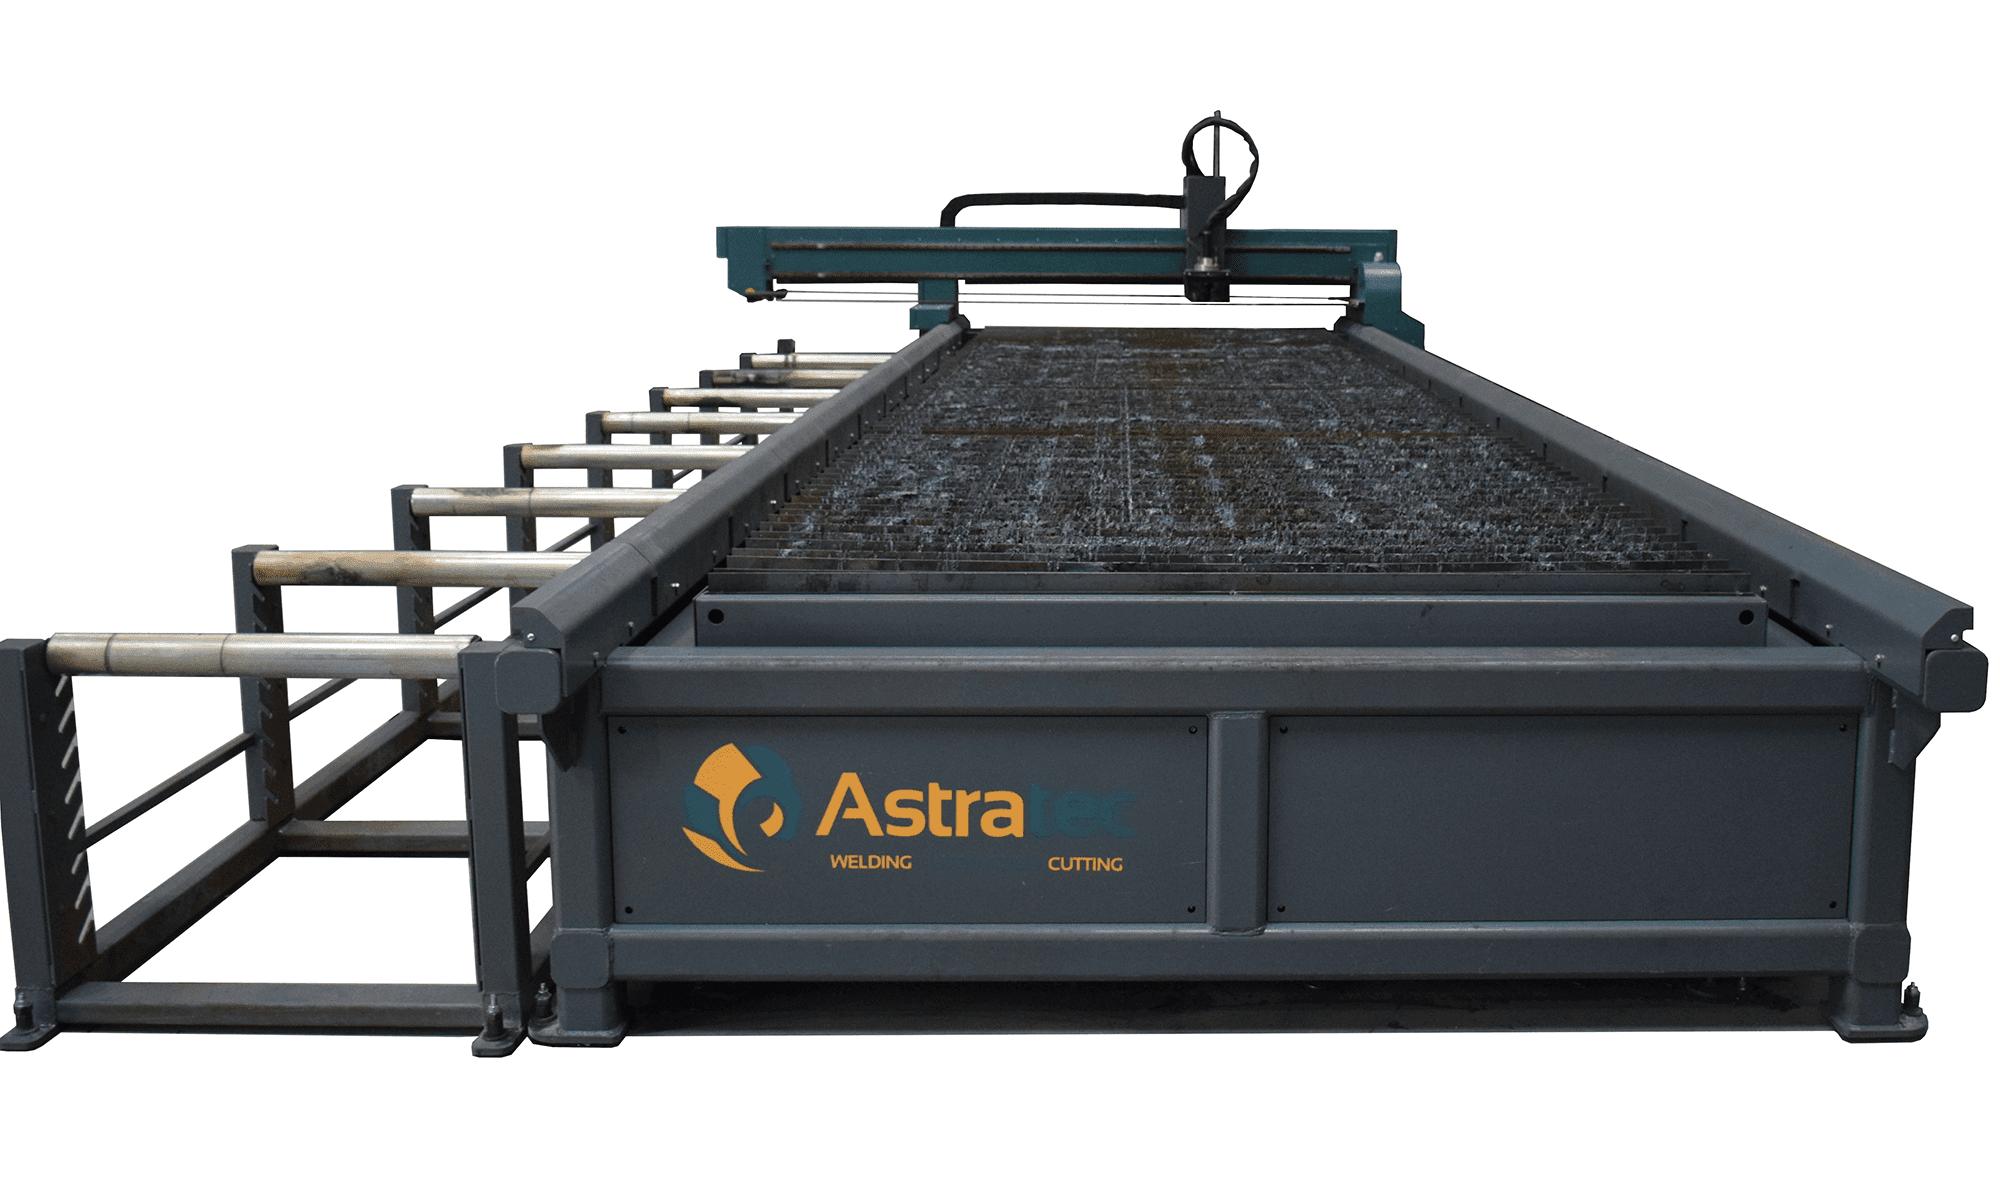 M serie Astratec - Plasmasnijmachines en Lasautomatisatie